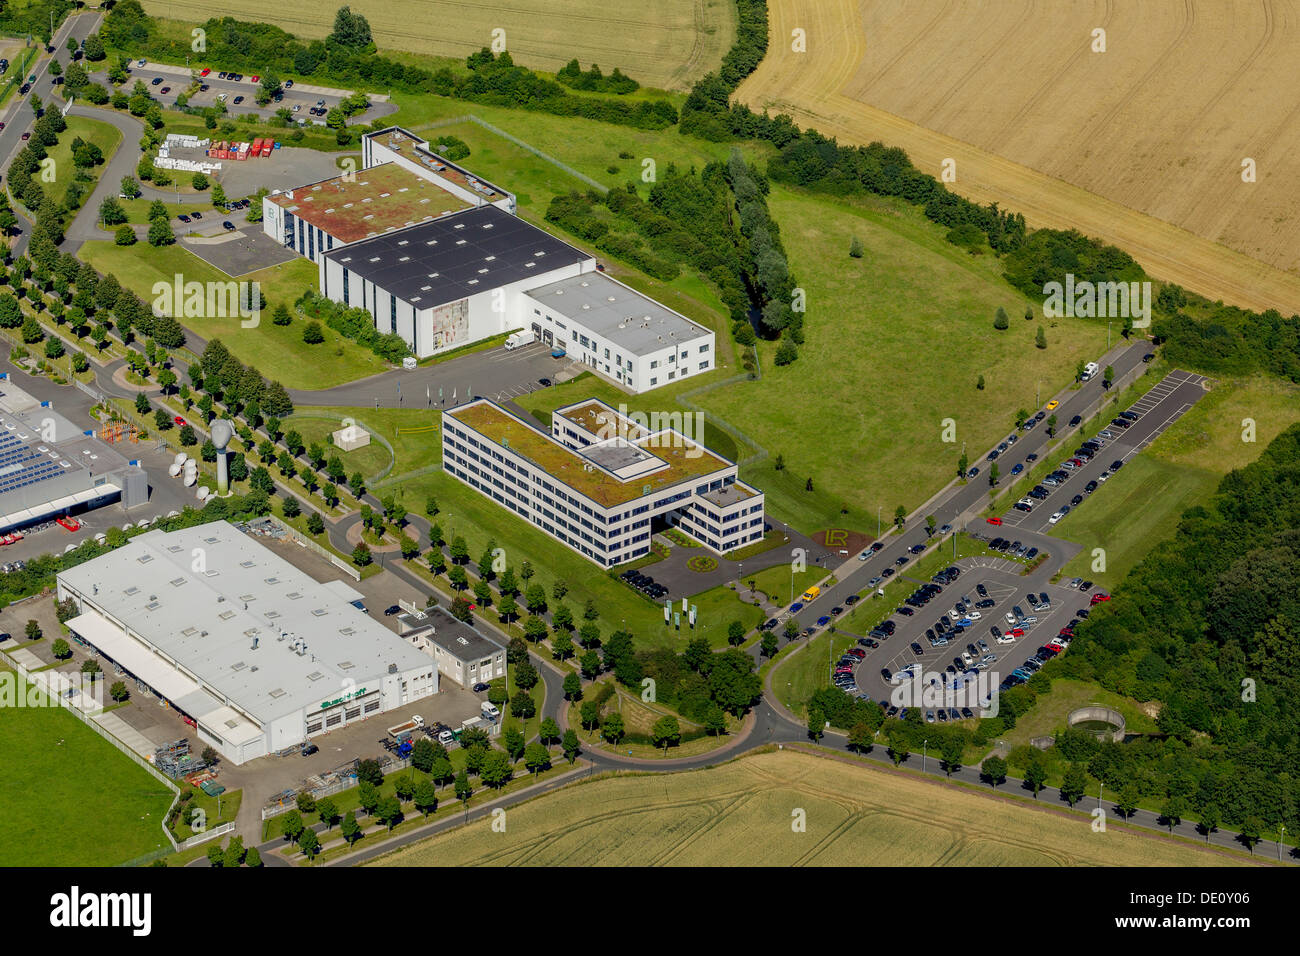 Aerial view, LR Health & Beauty Systems GmbH, Olfetal industrial estate, Ahlen, Ruhr area, North Rhine-Westphalia - Stock Image